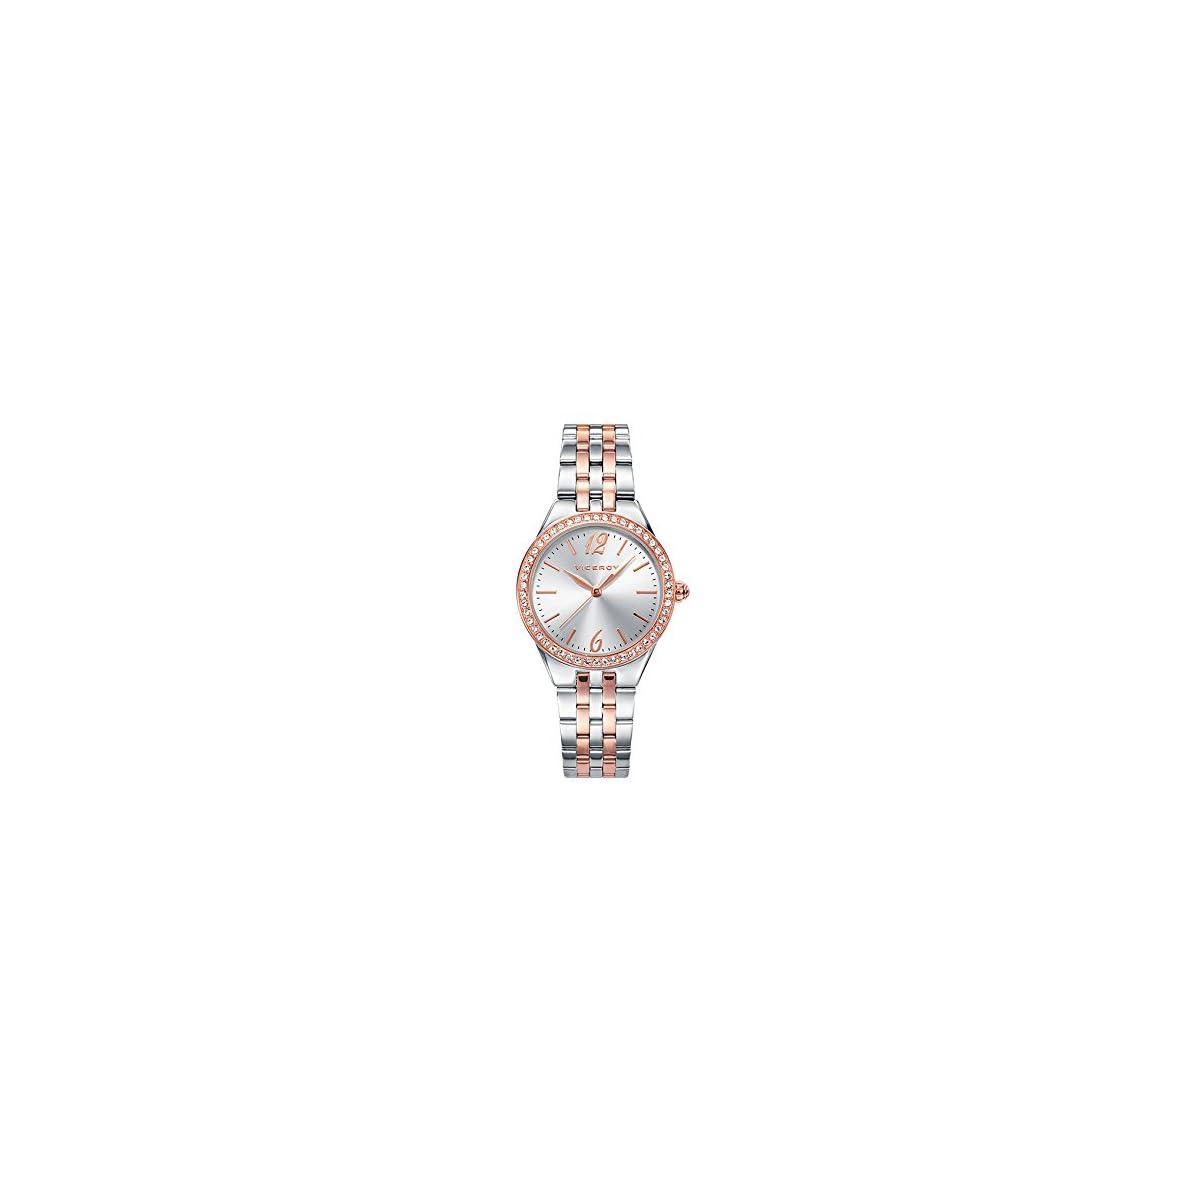 41lvWXmeDgL. SS1200  - Reloj Viceroy - Mujer 42232-95